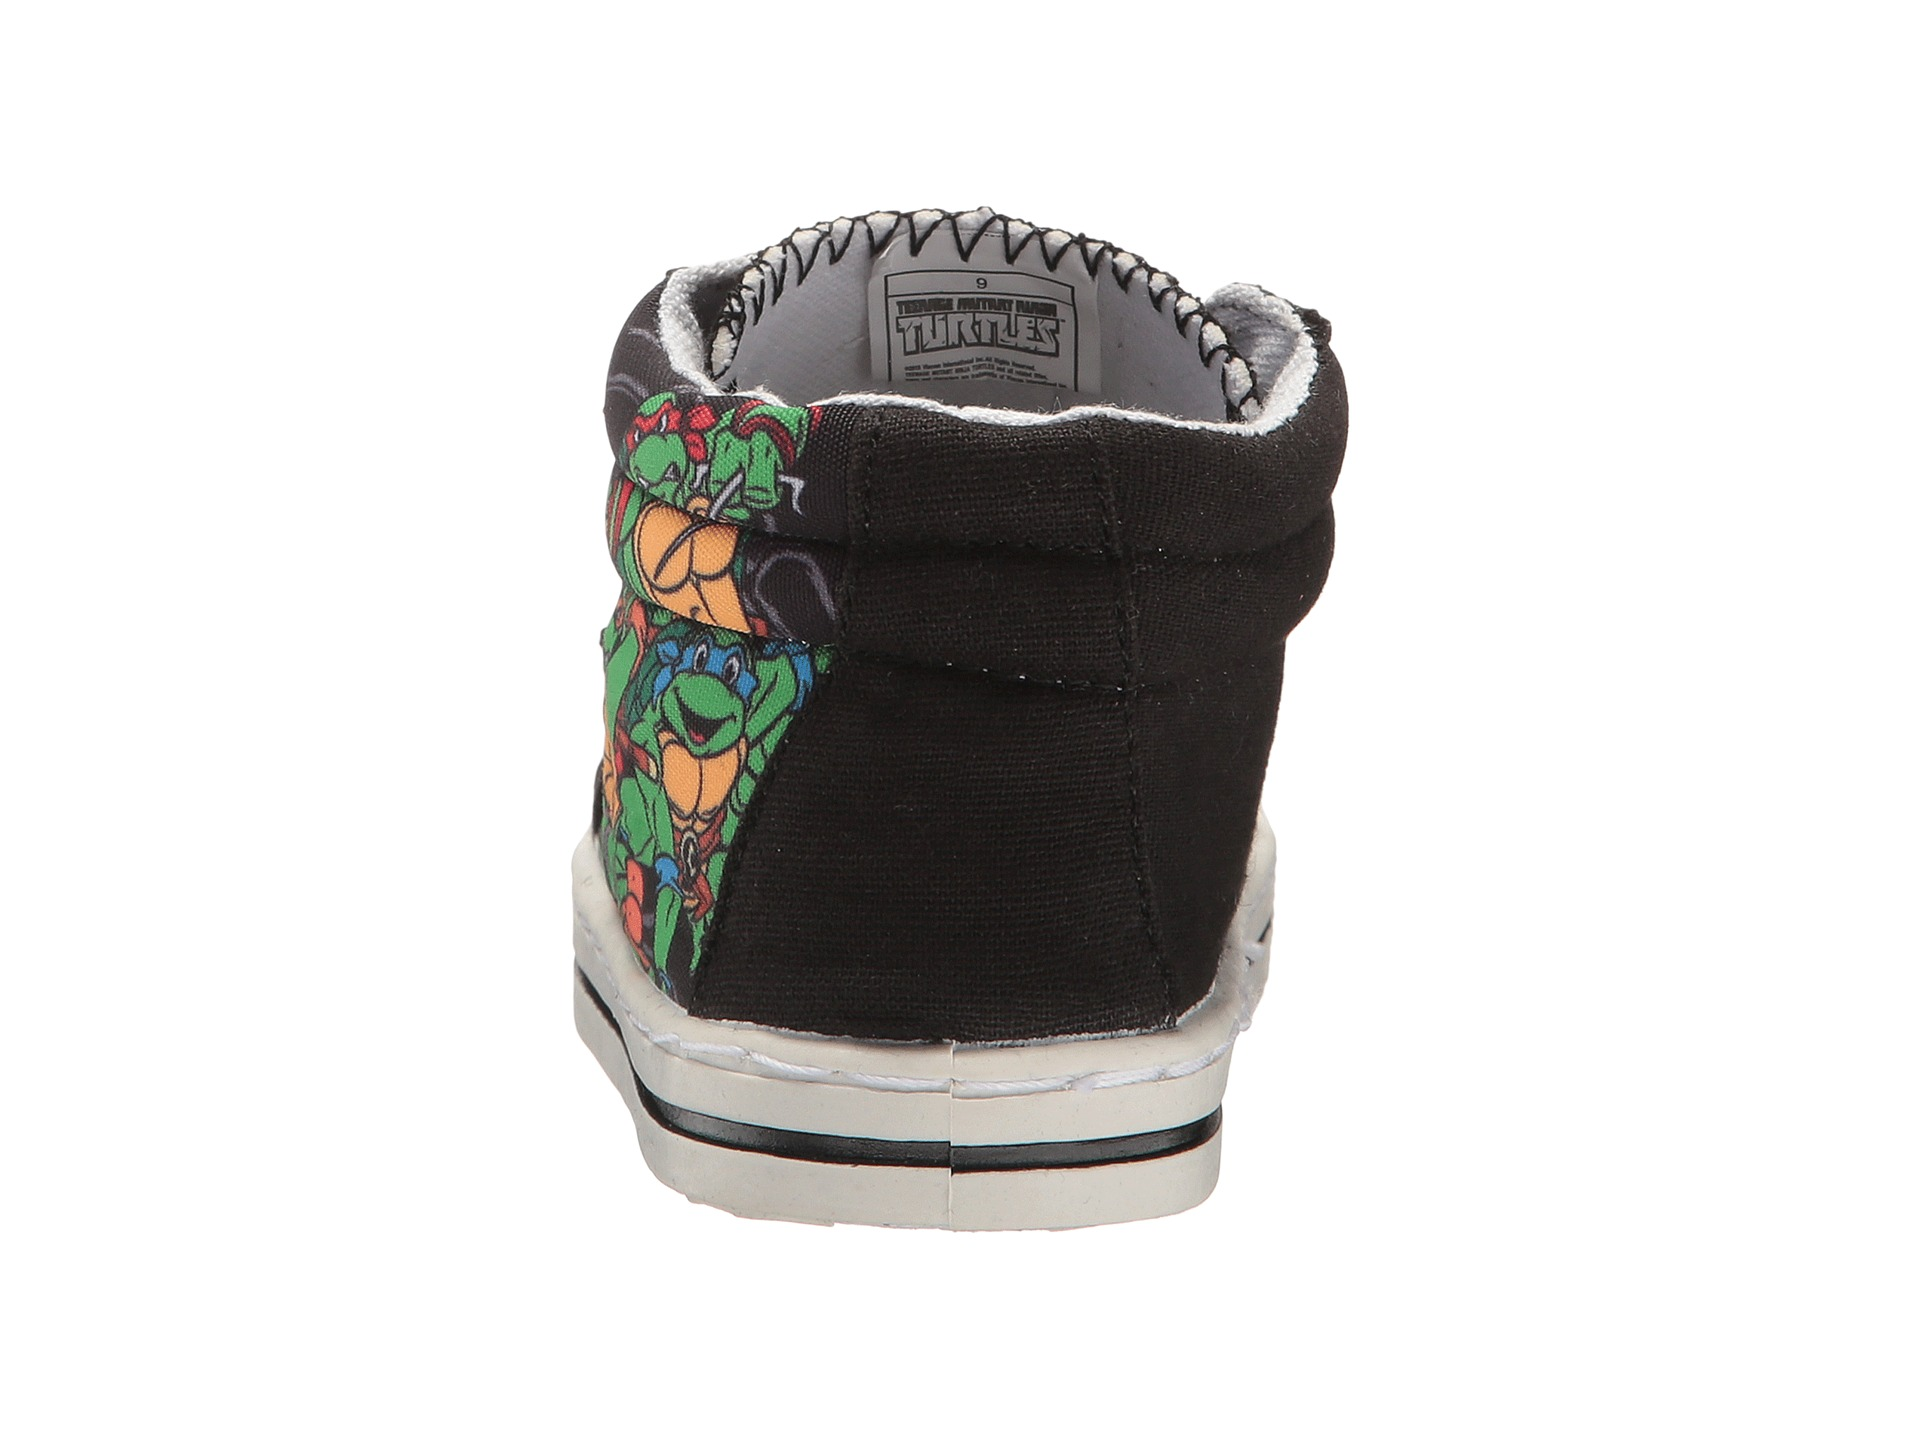 Josmo Kids Ninja Turtles High Top Sneaker Toddler Little